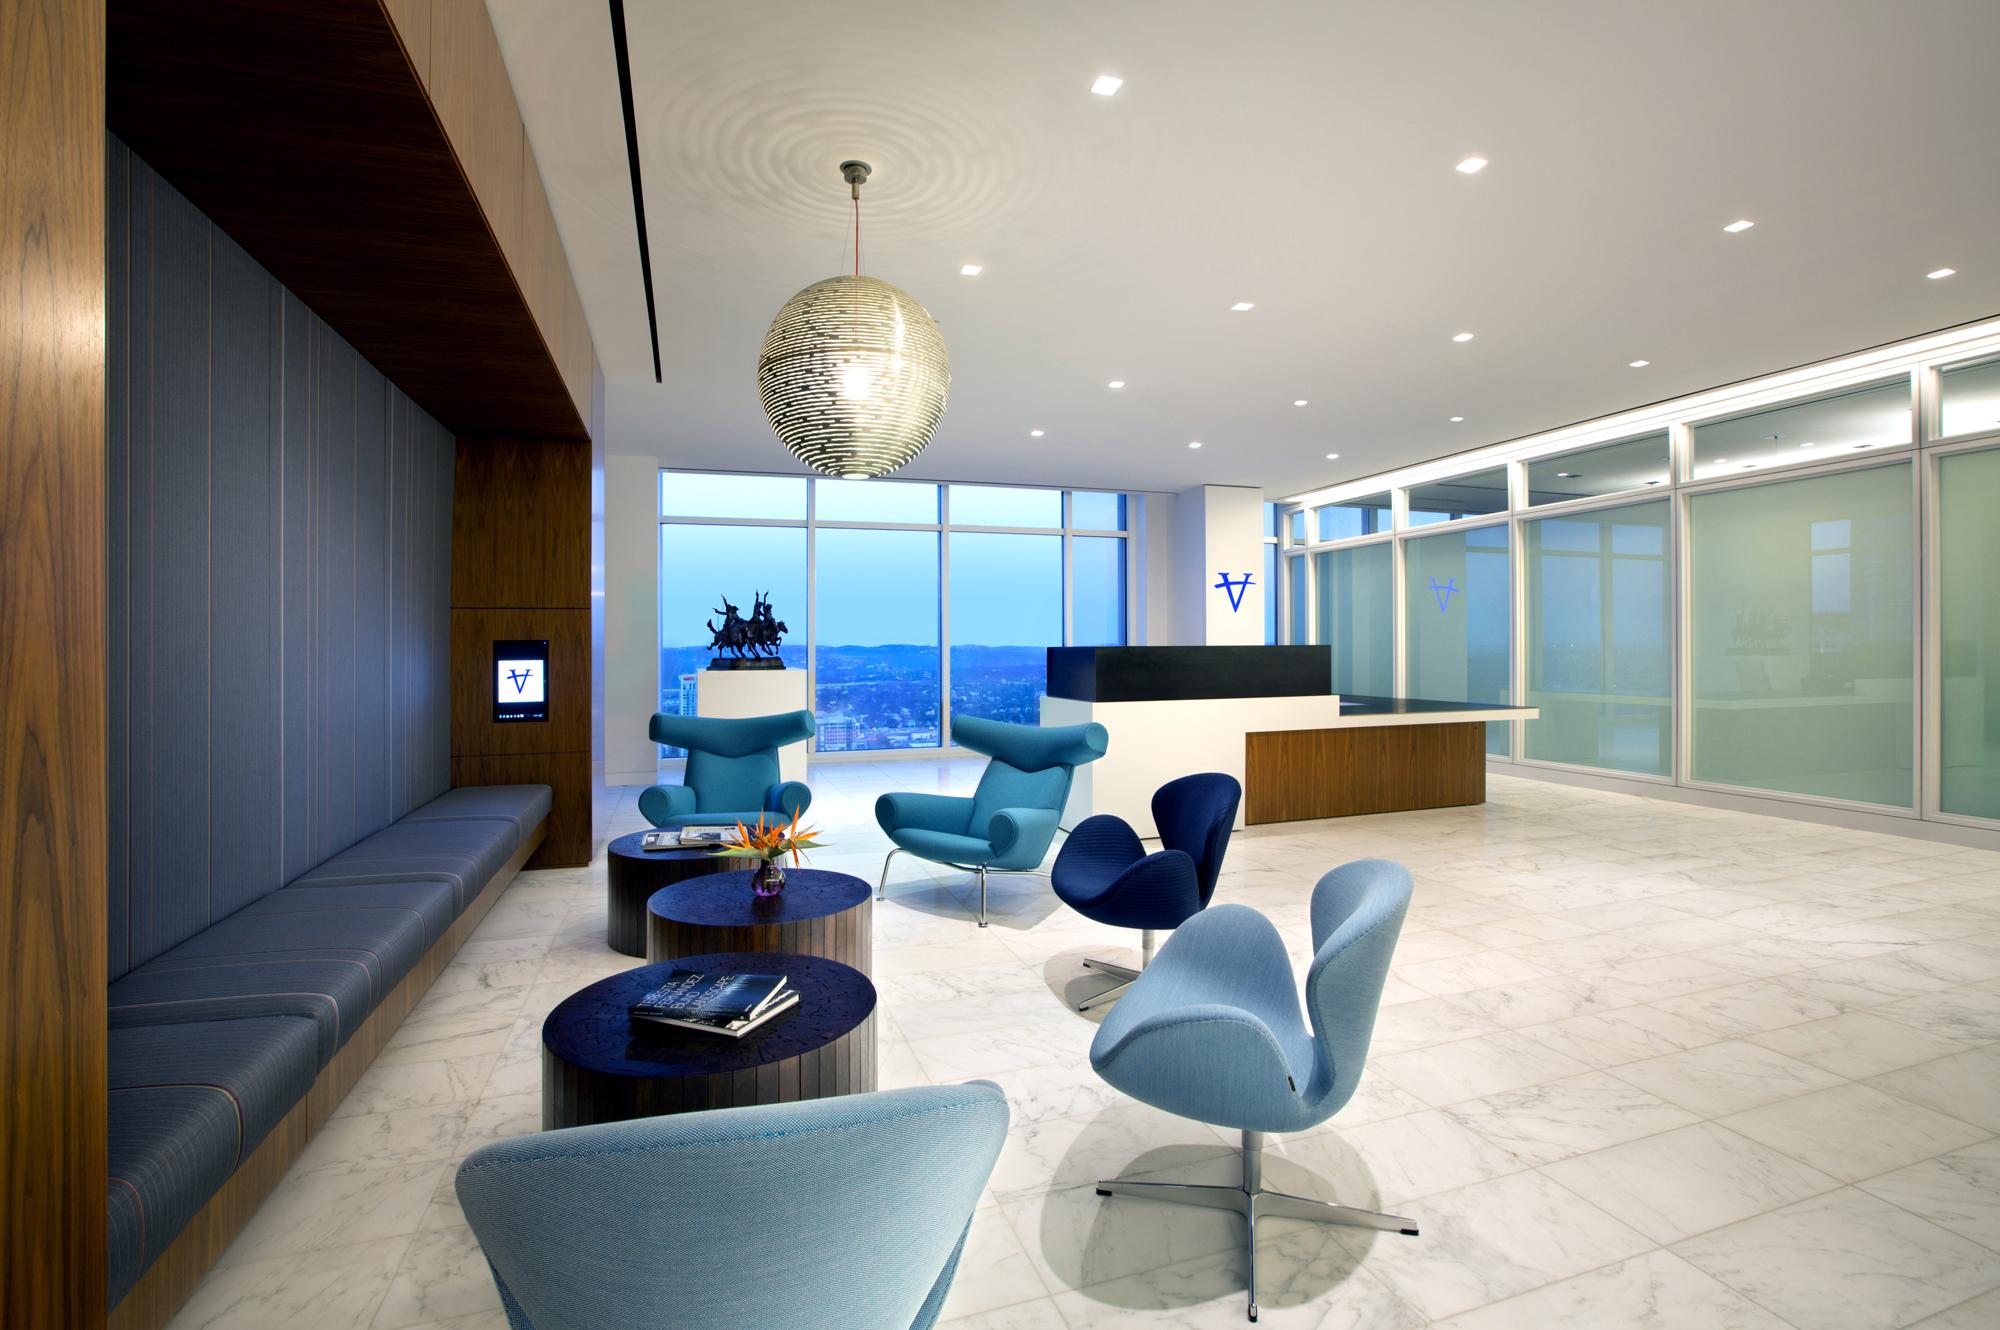 gensler-architects-interior-photography.jpg